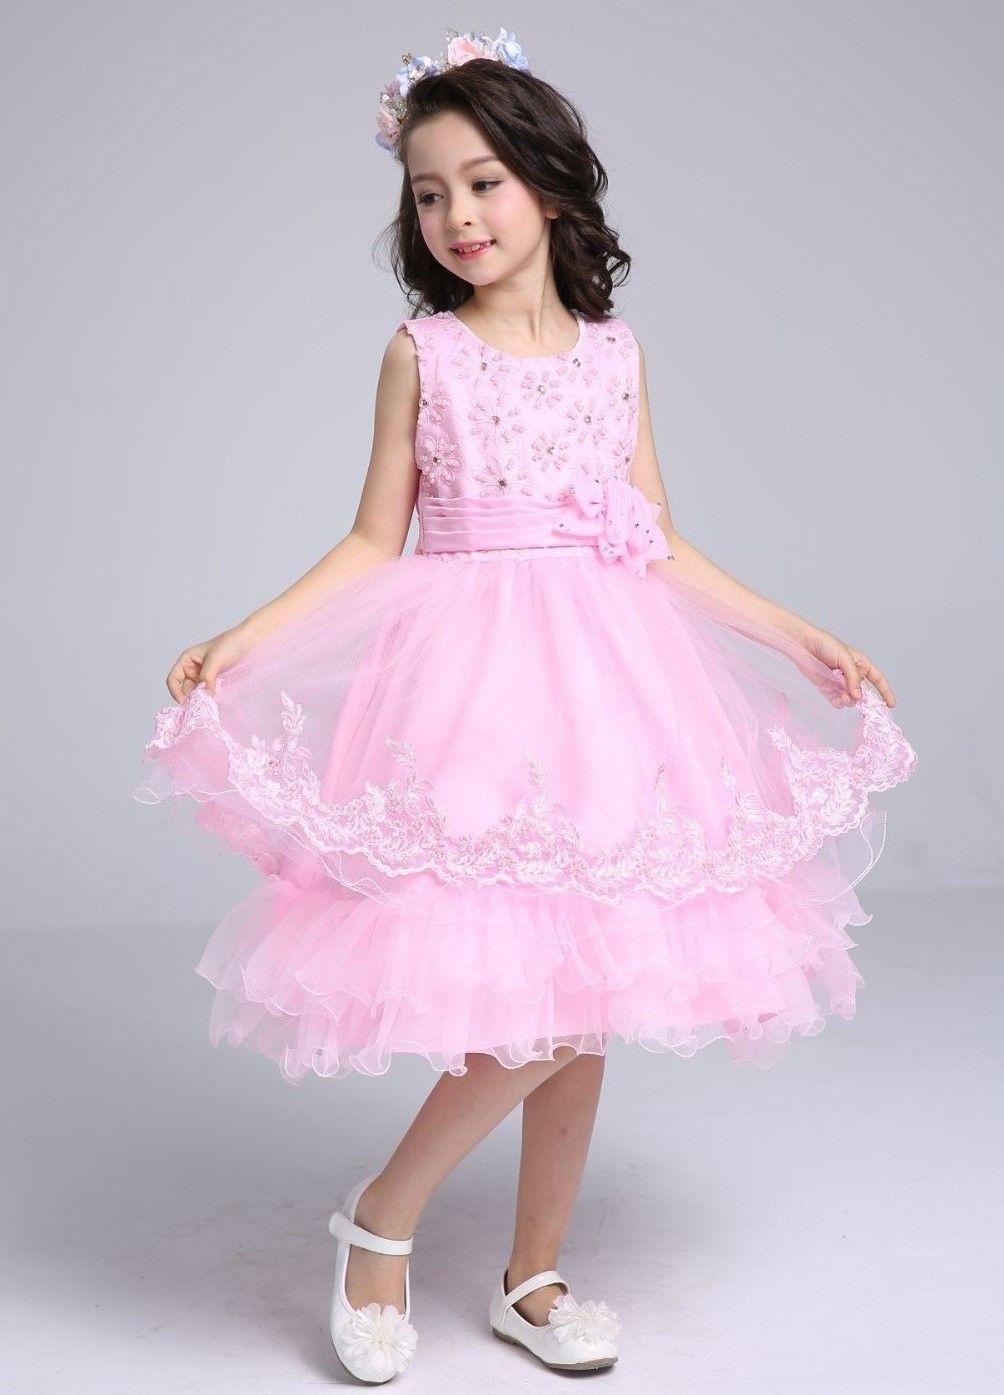 SALE Size 6 New Pink TUTU Dress Girls Wedding Party Church Flower ...